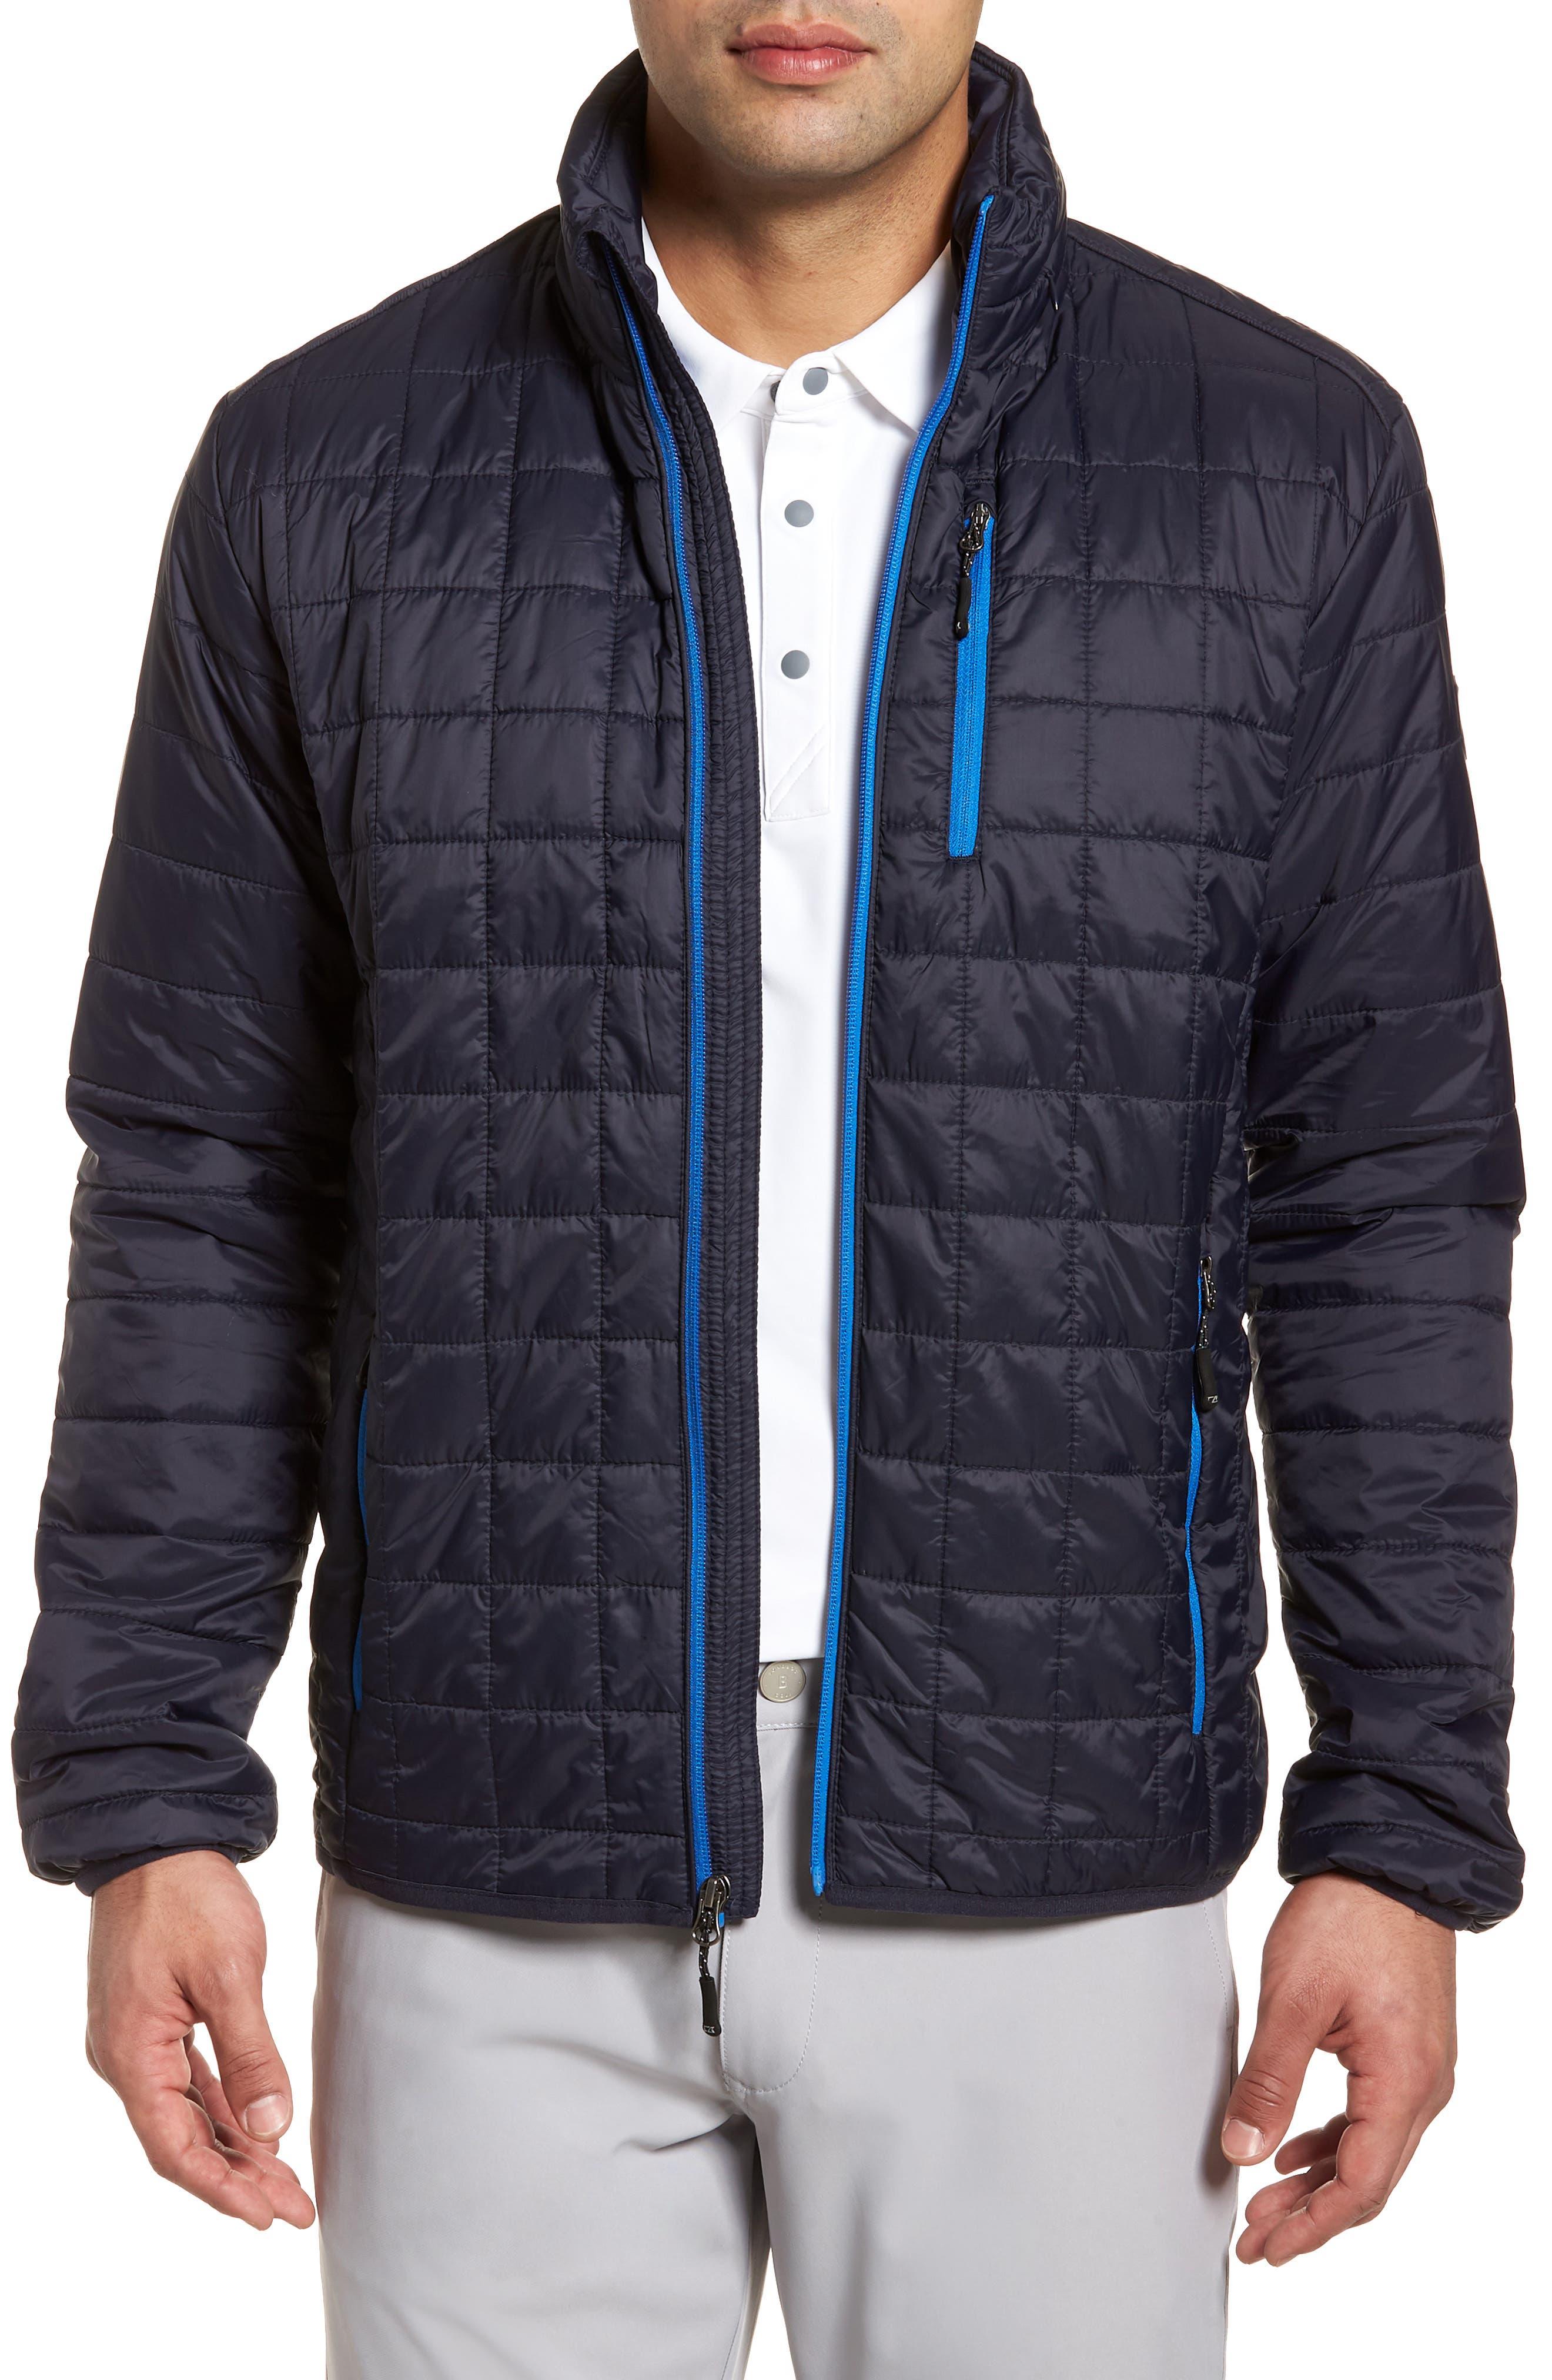 Rainier Primaloft Insulated Jacket